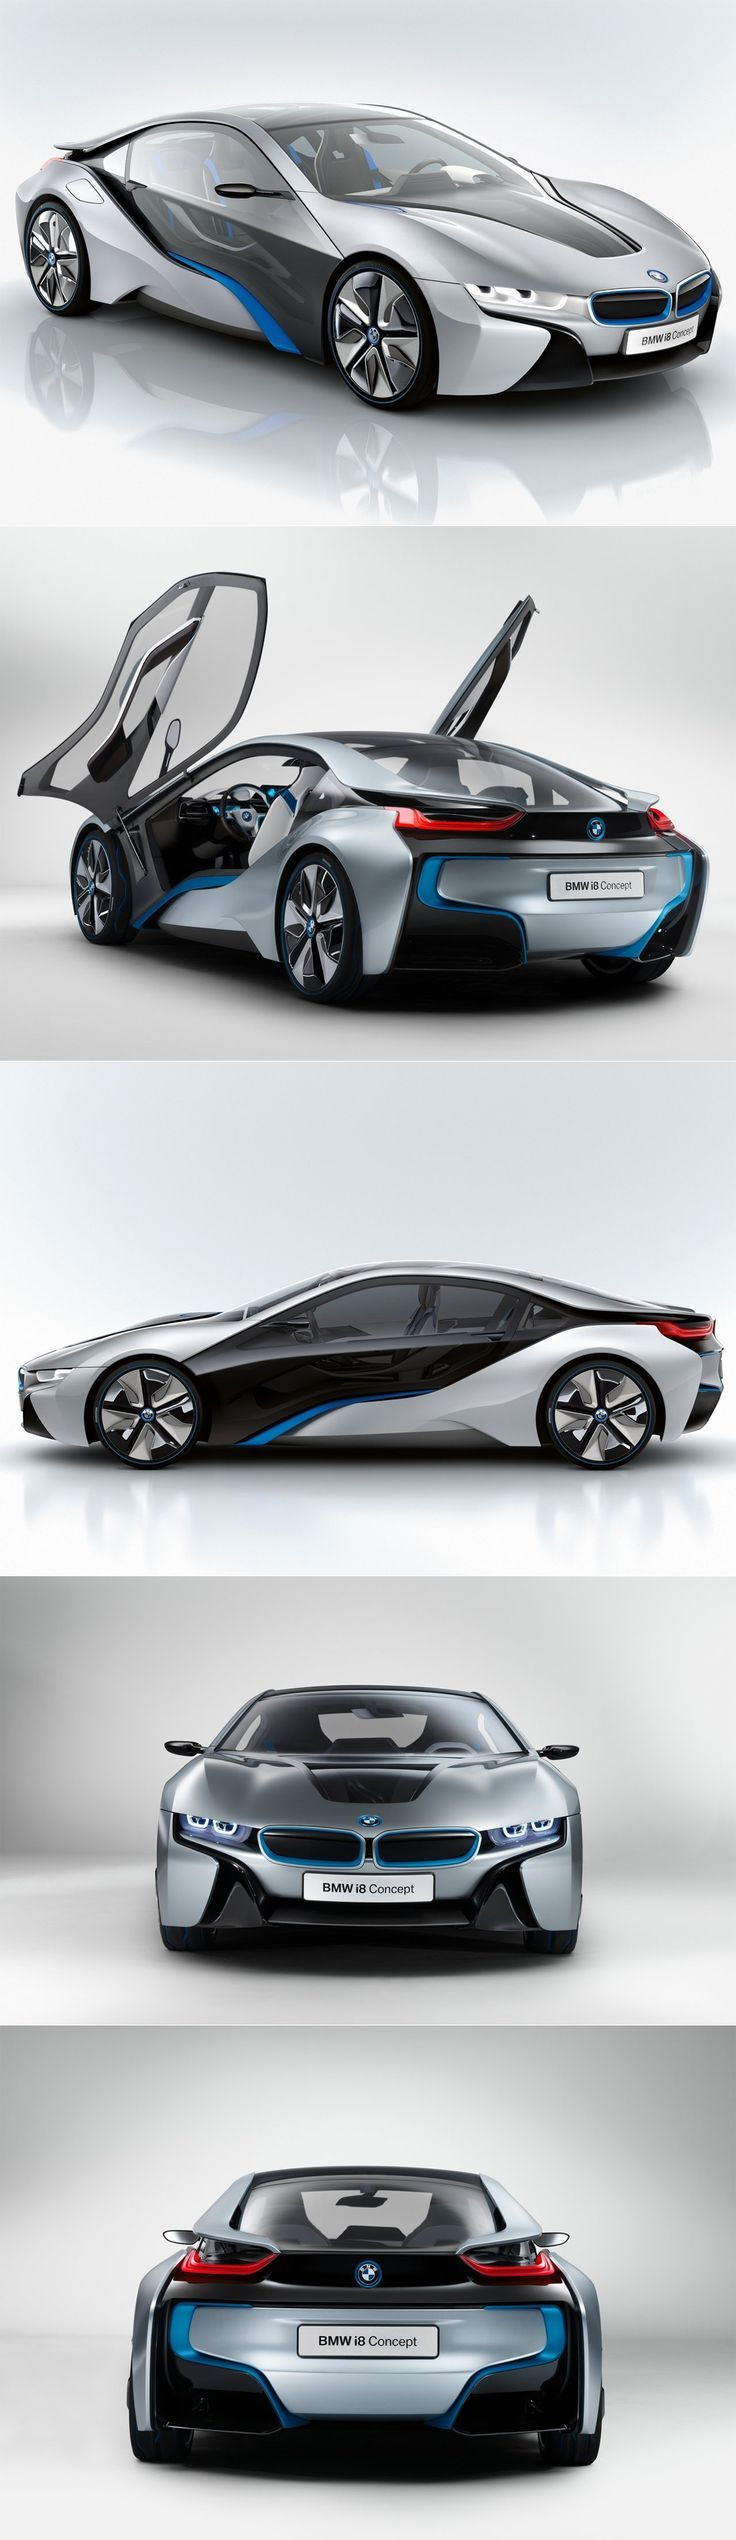 BMW Concept: https://www.amazon.co.uk/Baby-Car-Mirror-Shatterproof-Installation/dp/B06XHG6SSY/ref=sr_1_2?ie=UTF8&qid=1499074433&sr=8-2&keywords=Kingseye